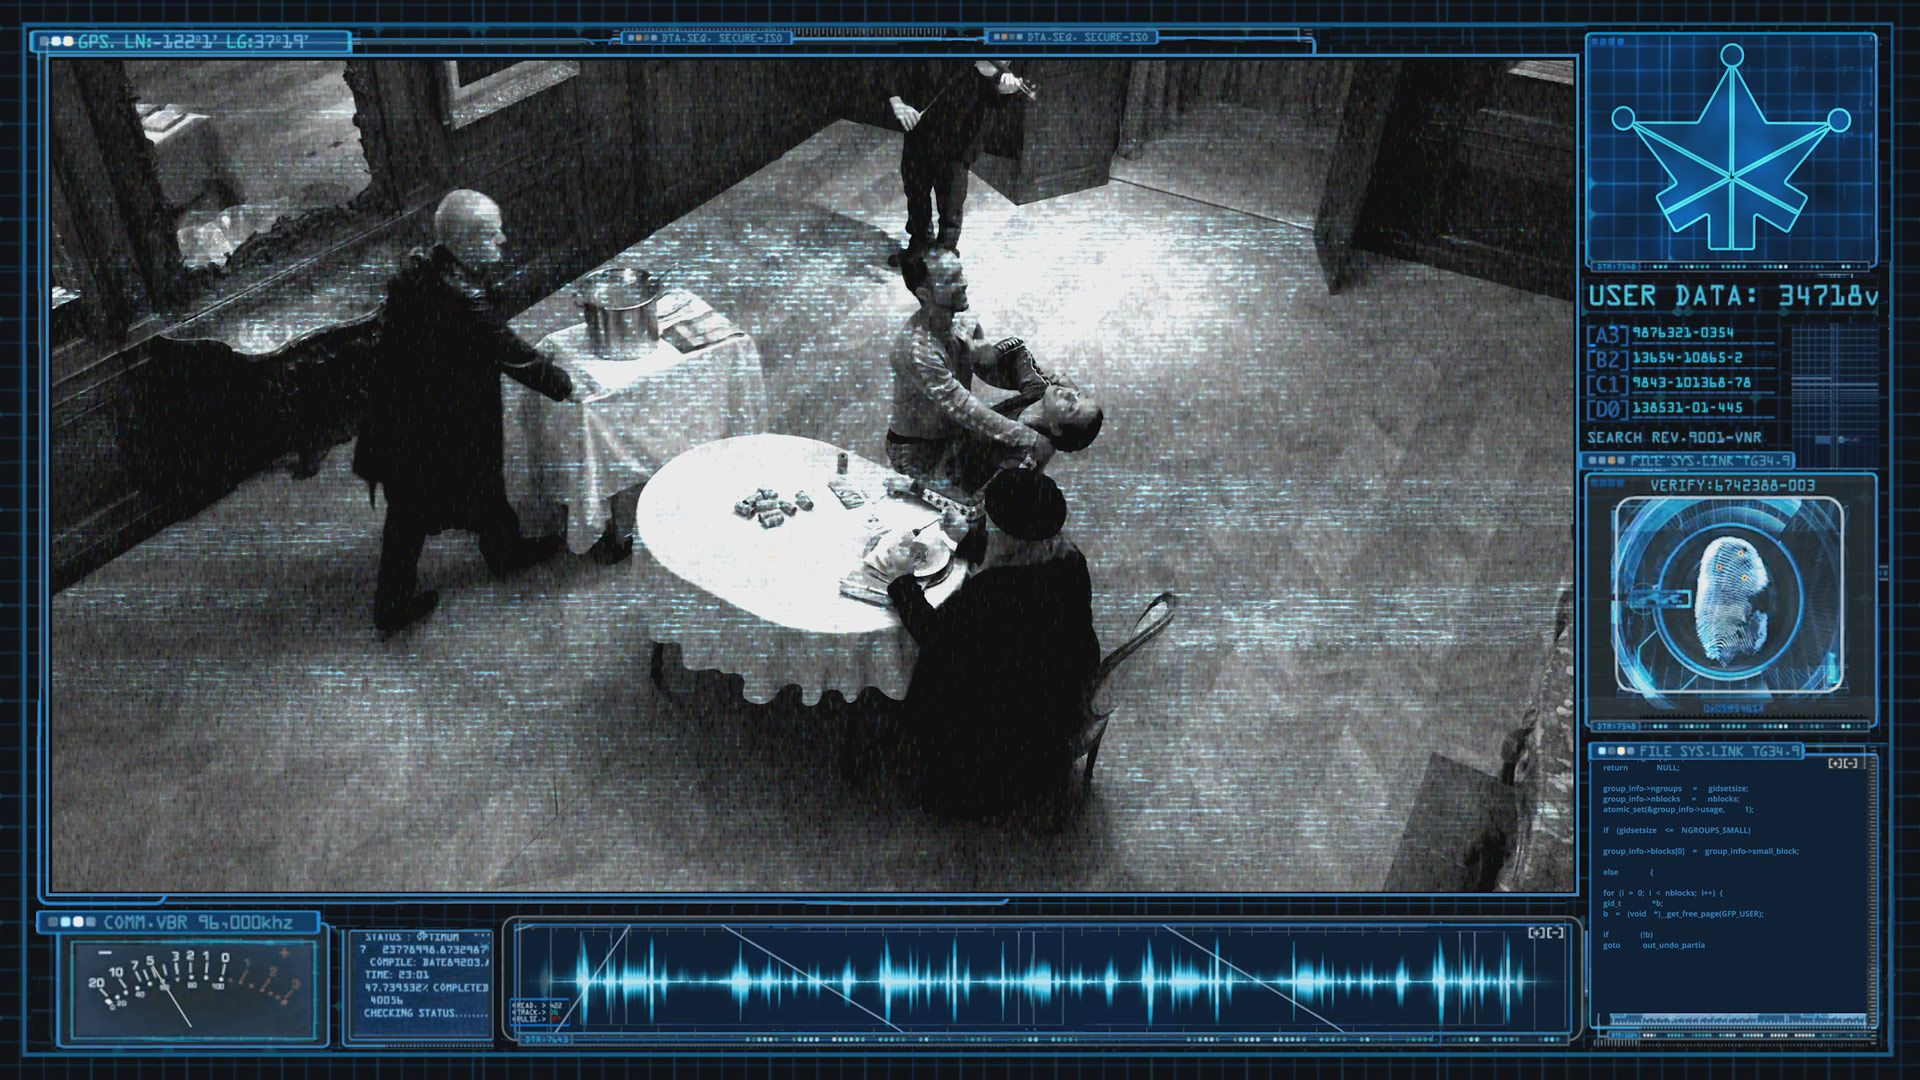 screenshot of fake CCTV for TV series La Loi C'est La Loi filmed by Les Gamins for TV5 Unis